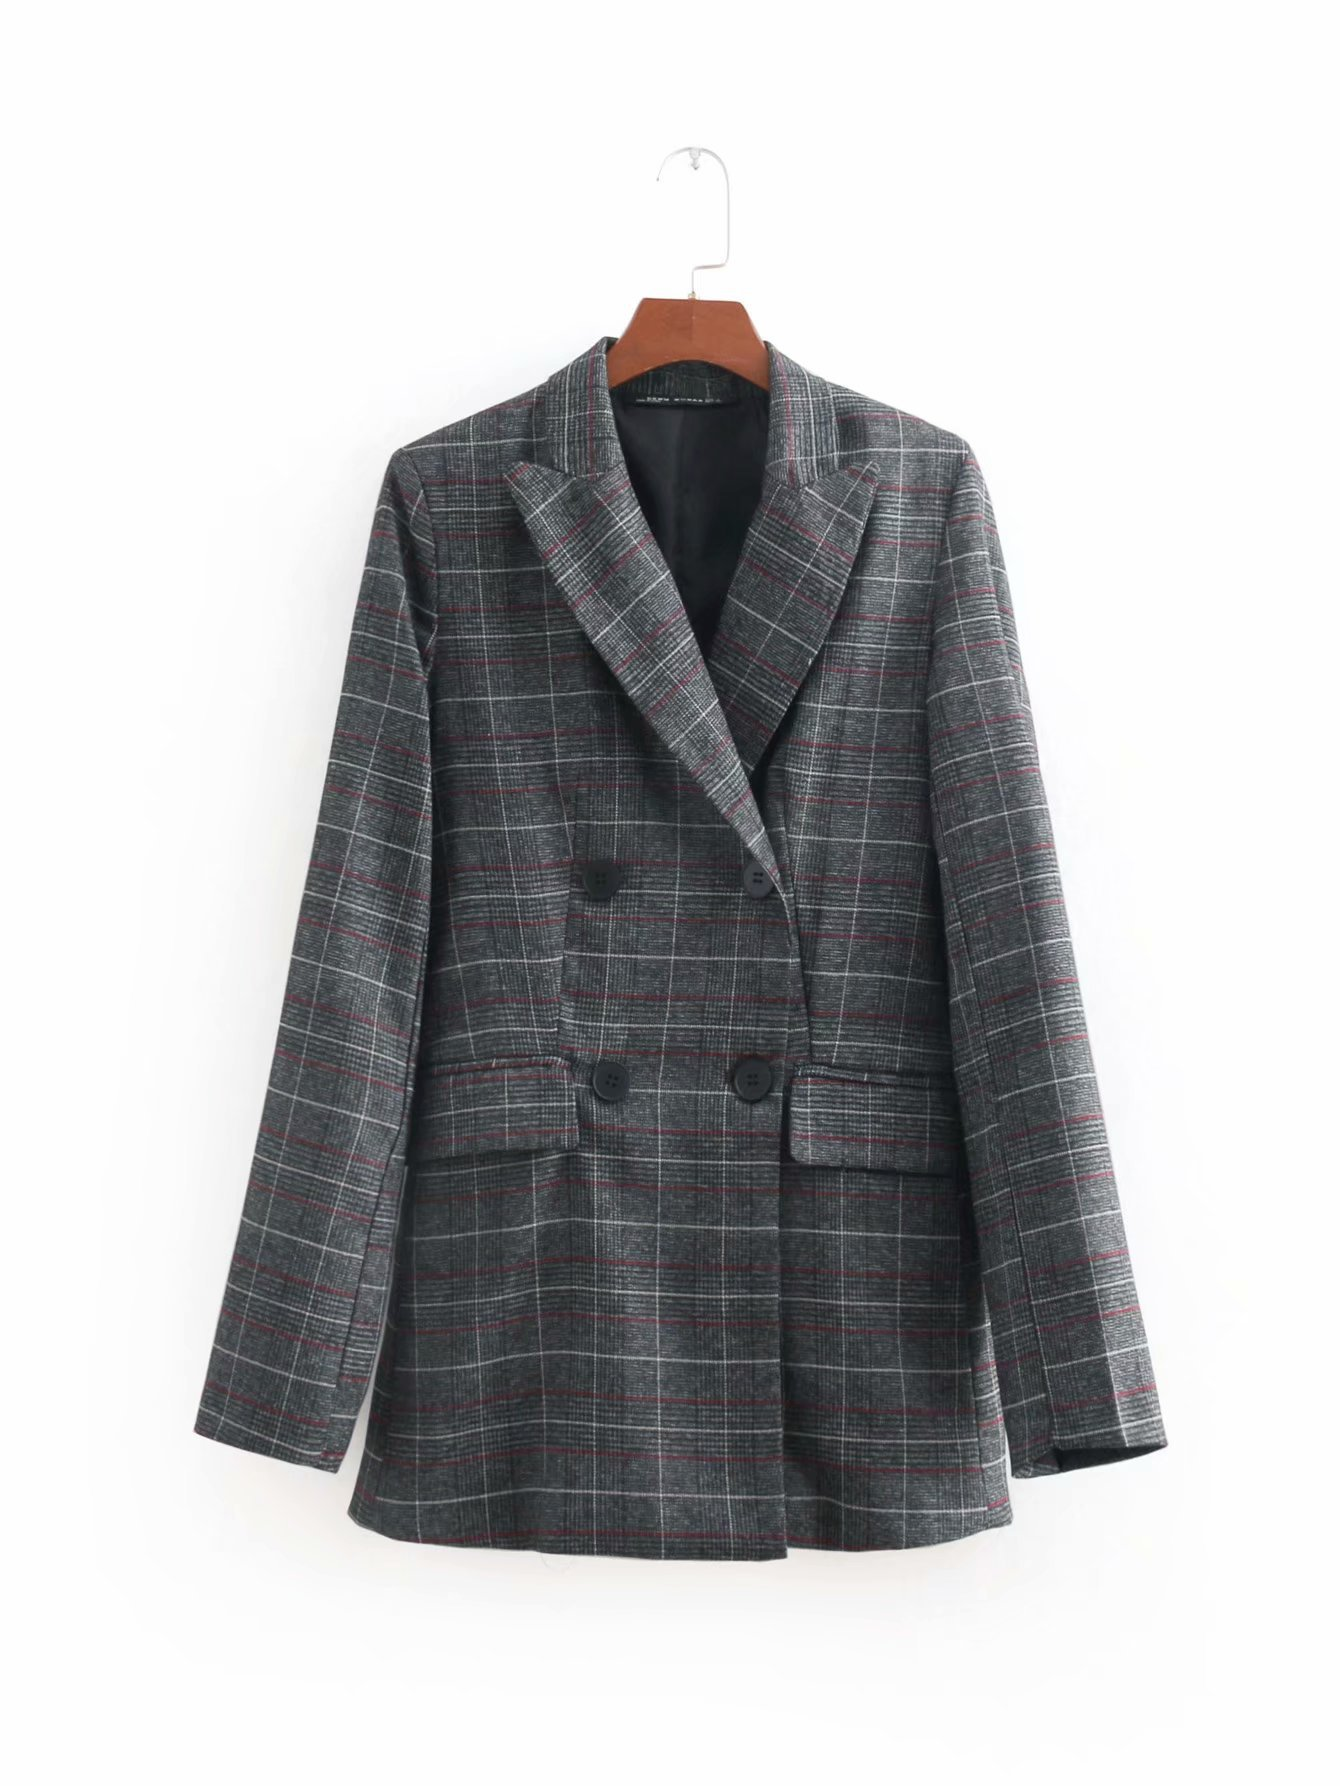 womens blazer casual 2019 girls korean women blazers harajuku woman clothes plaid double breasted harajuku gothic jacket